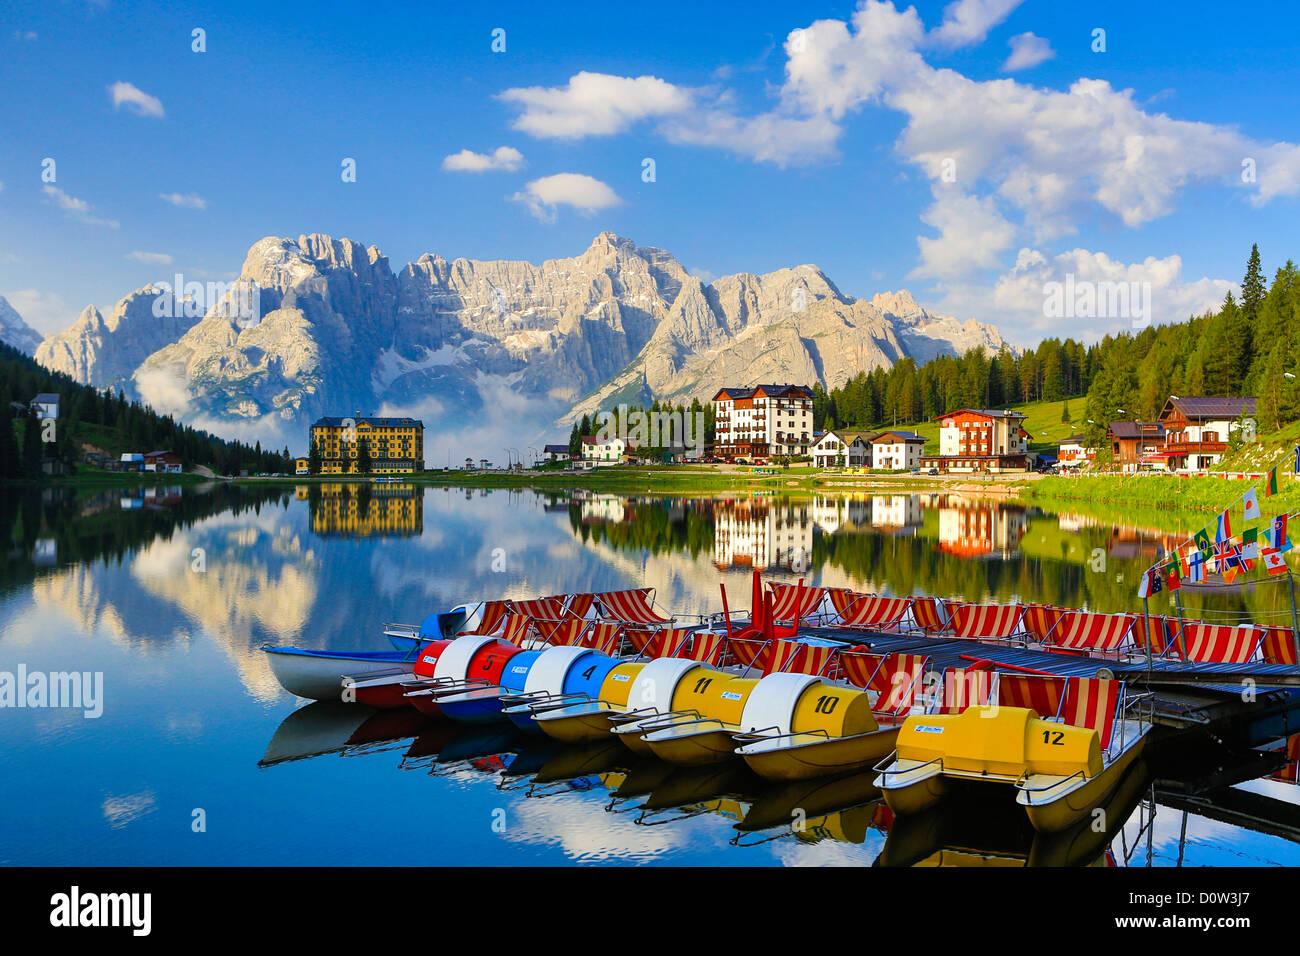 Italia, Europa, viajes, dolomitas, Alpes, Lago Missurina hidropedal, barcos, nubes, colorido, montañas, la Imagen De Stock